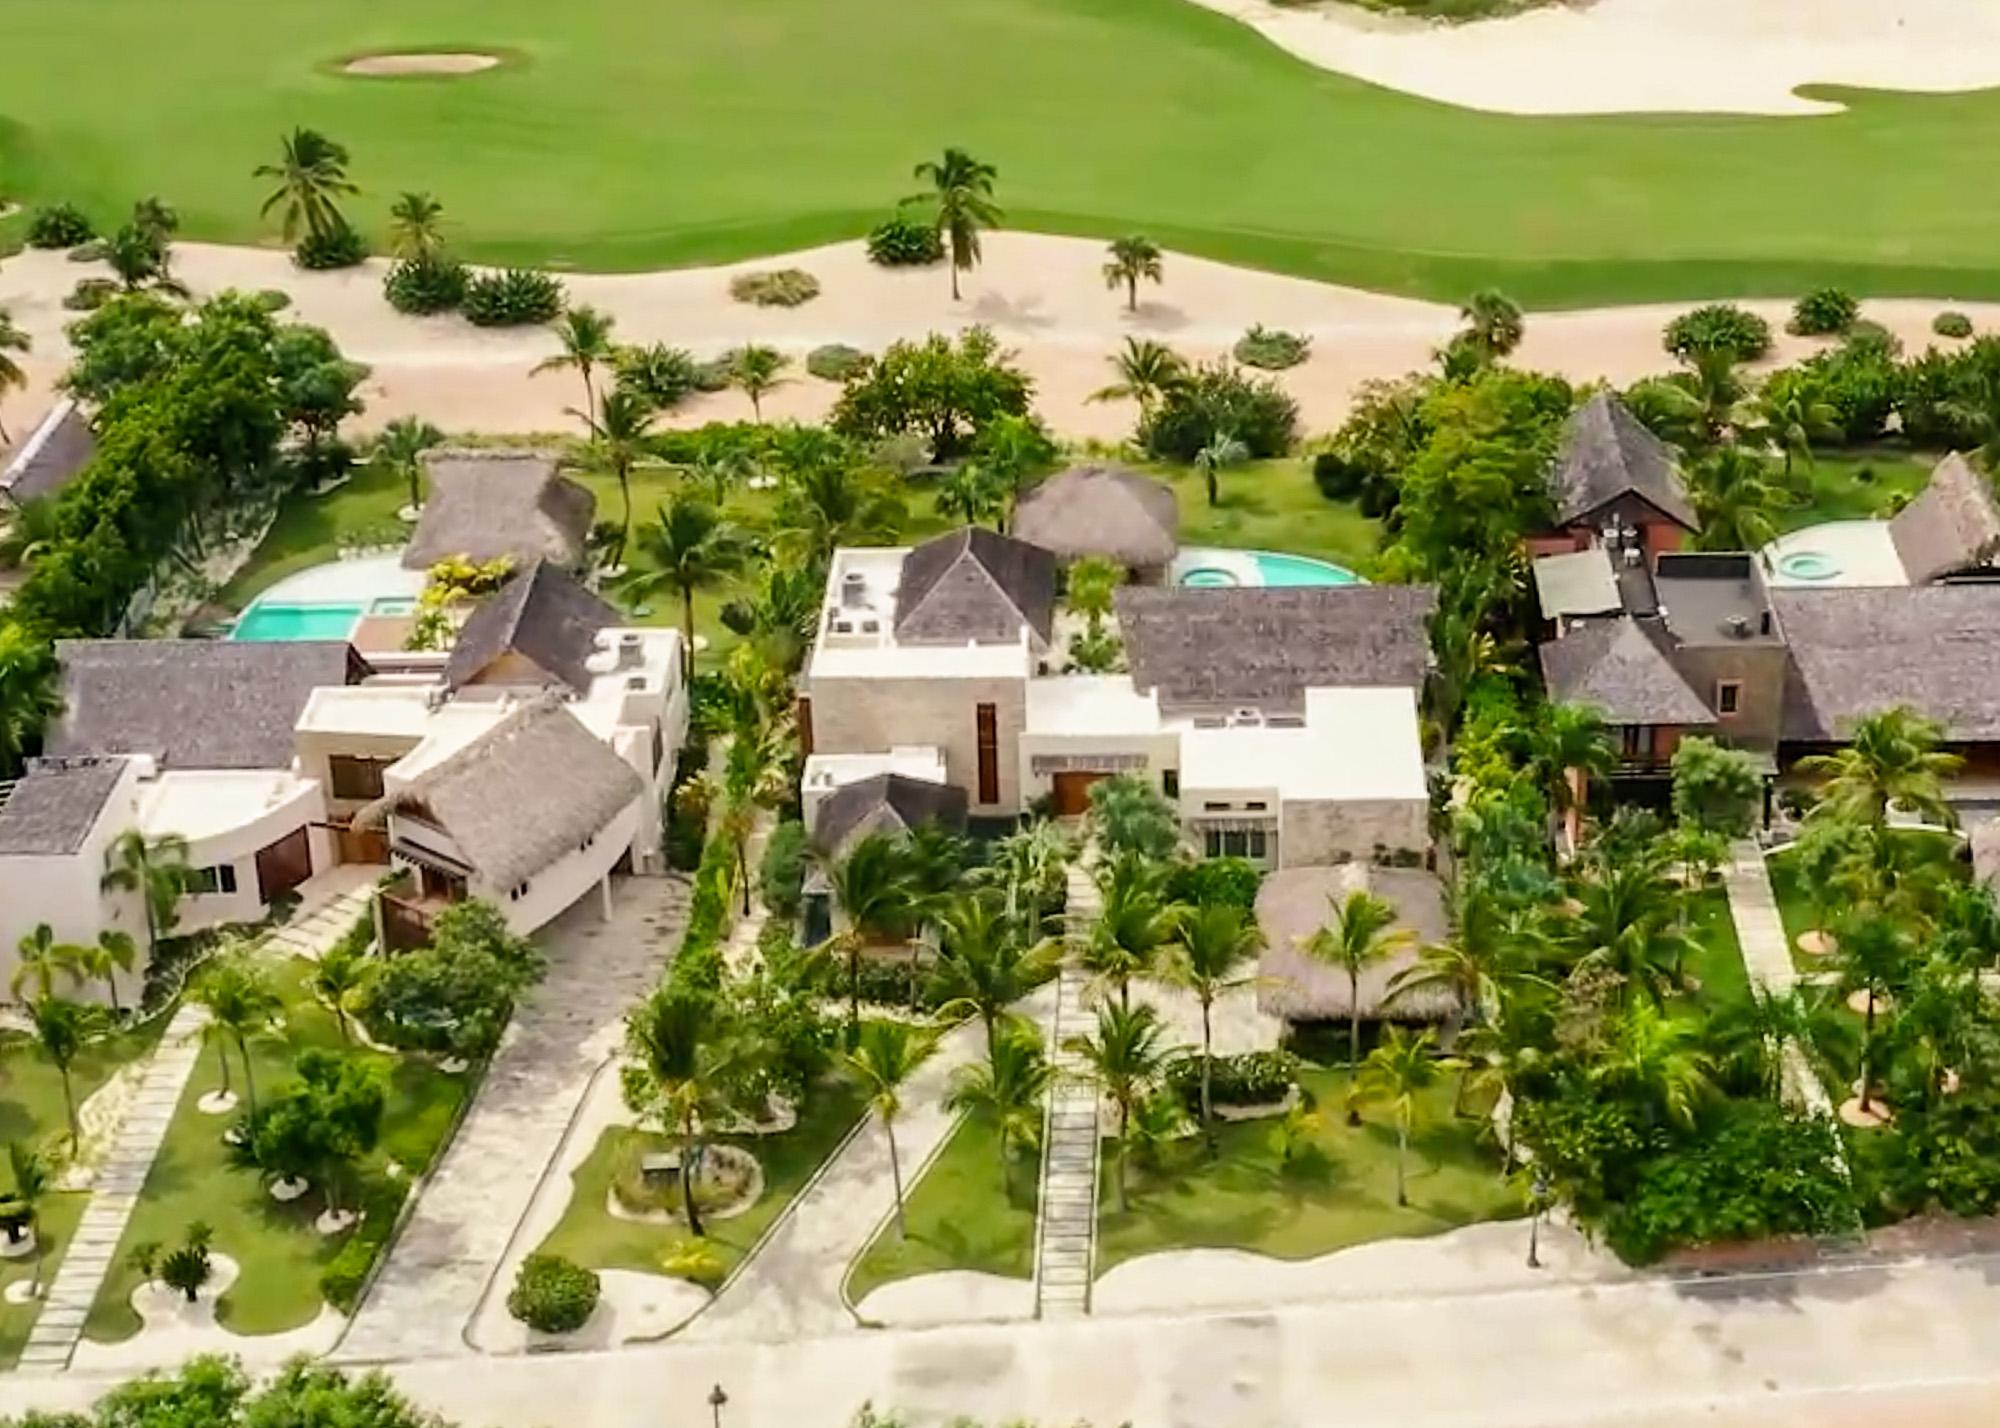 Exquisite Interiors and Expansive Gardens GolfFront Arena Cayuco